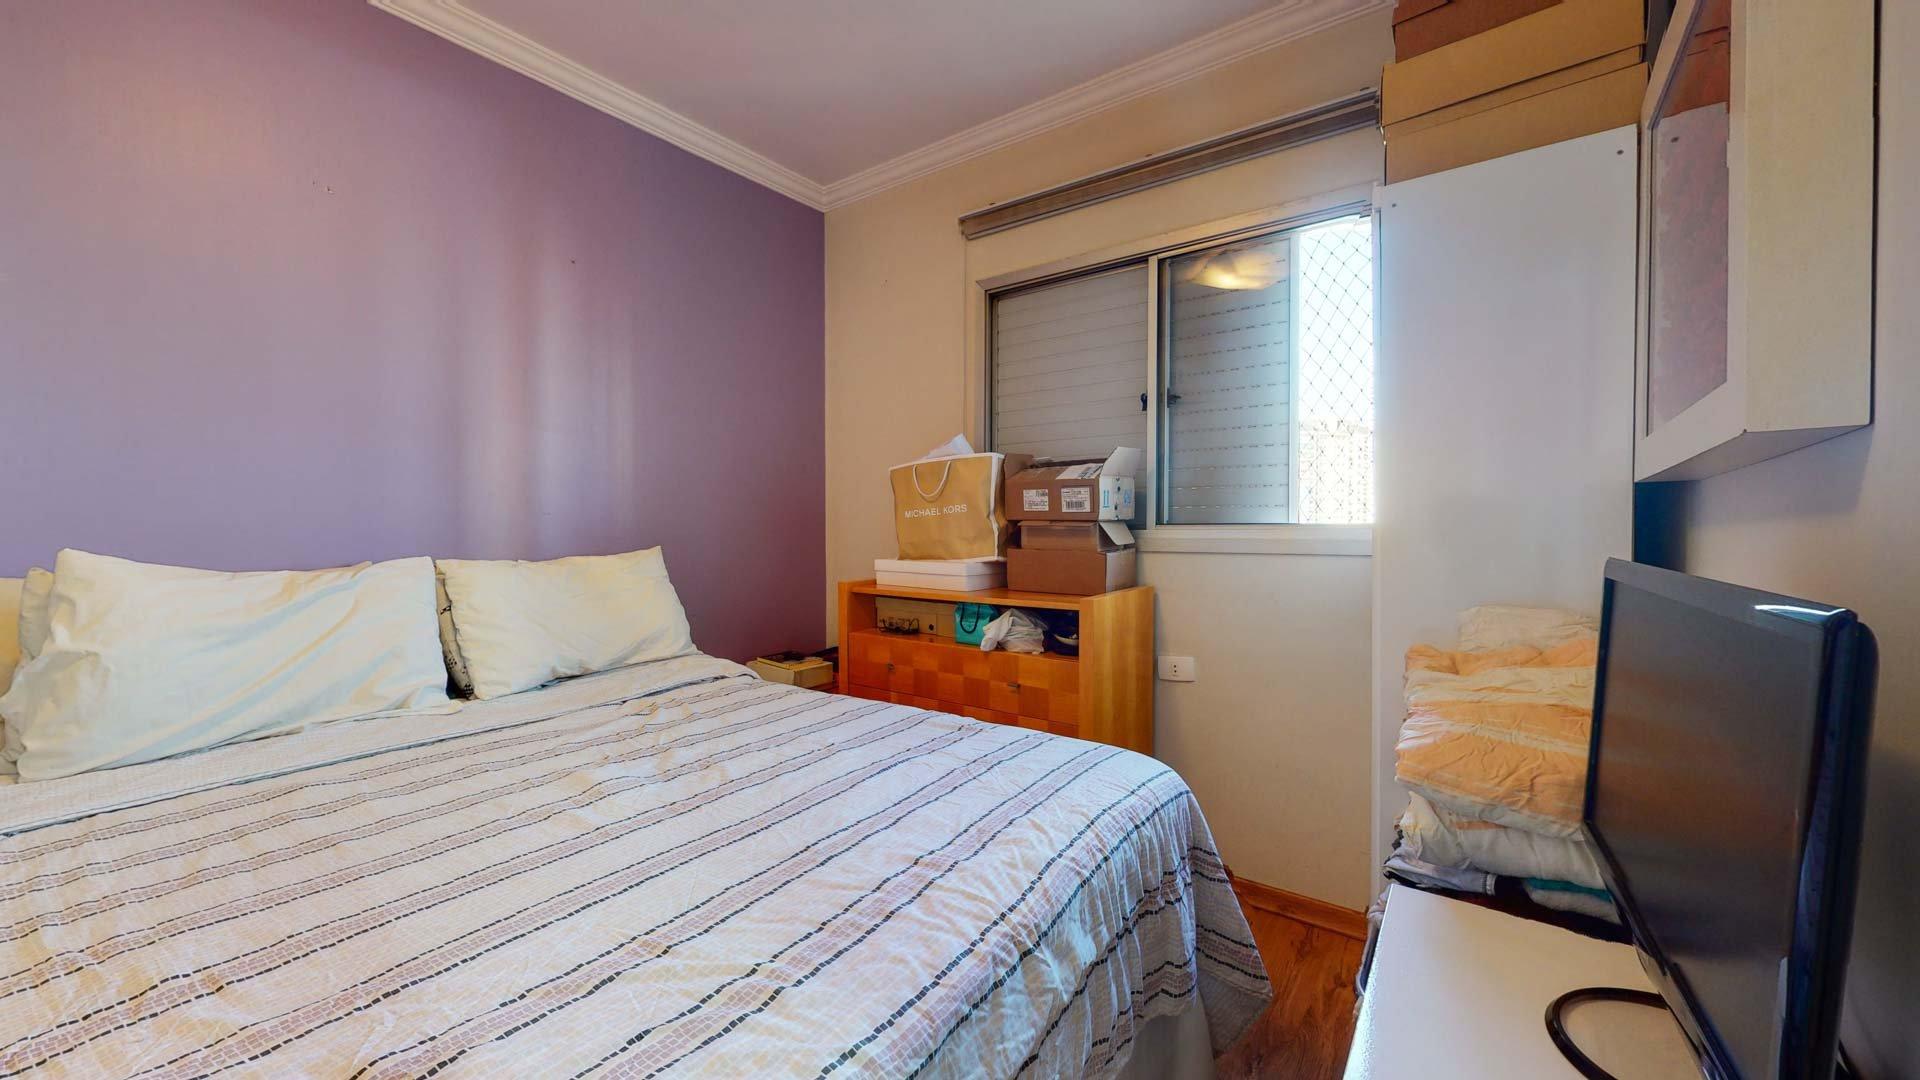 Rua Joinville 55, Paraíso, São Paulo 04008-020, 1 Dormitório Dormitórios, 1 Sala Salas,1 BanheiroBanheiros,Apartamento,Vendas,Edifício ROYAL IBIRAPUERA PARK,Rua Joinville,11,1061